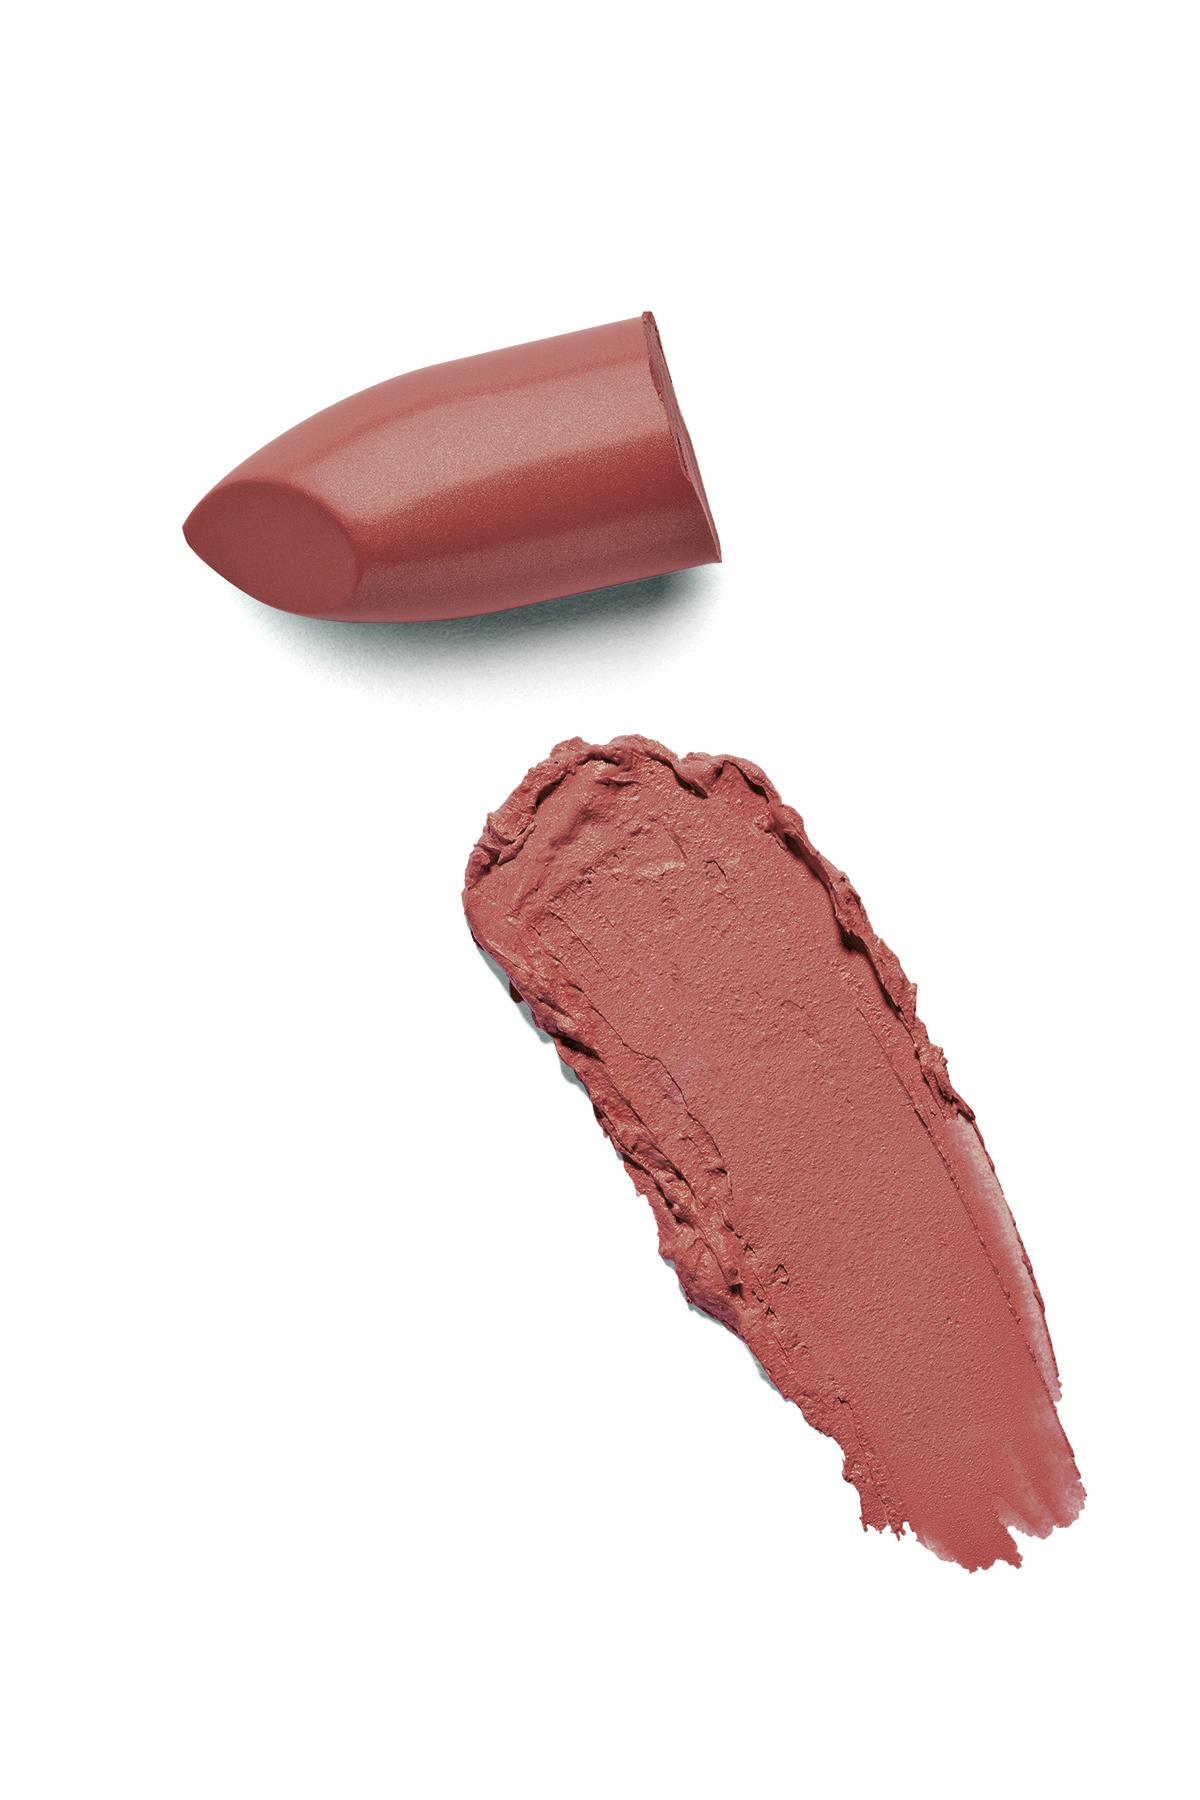 Matte Lipstick - 182 -Lipstick